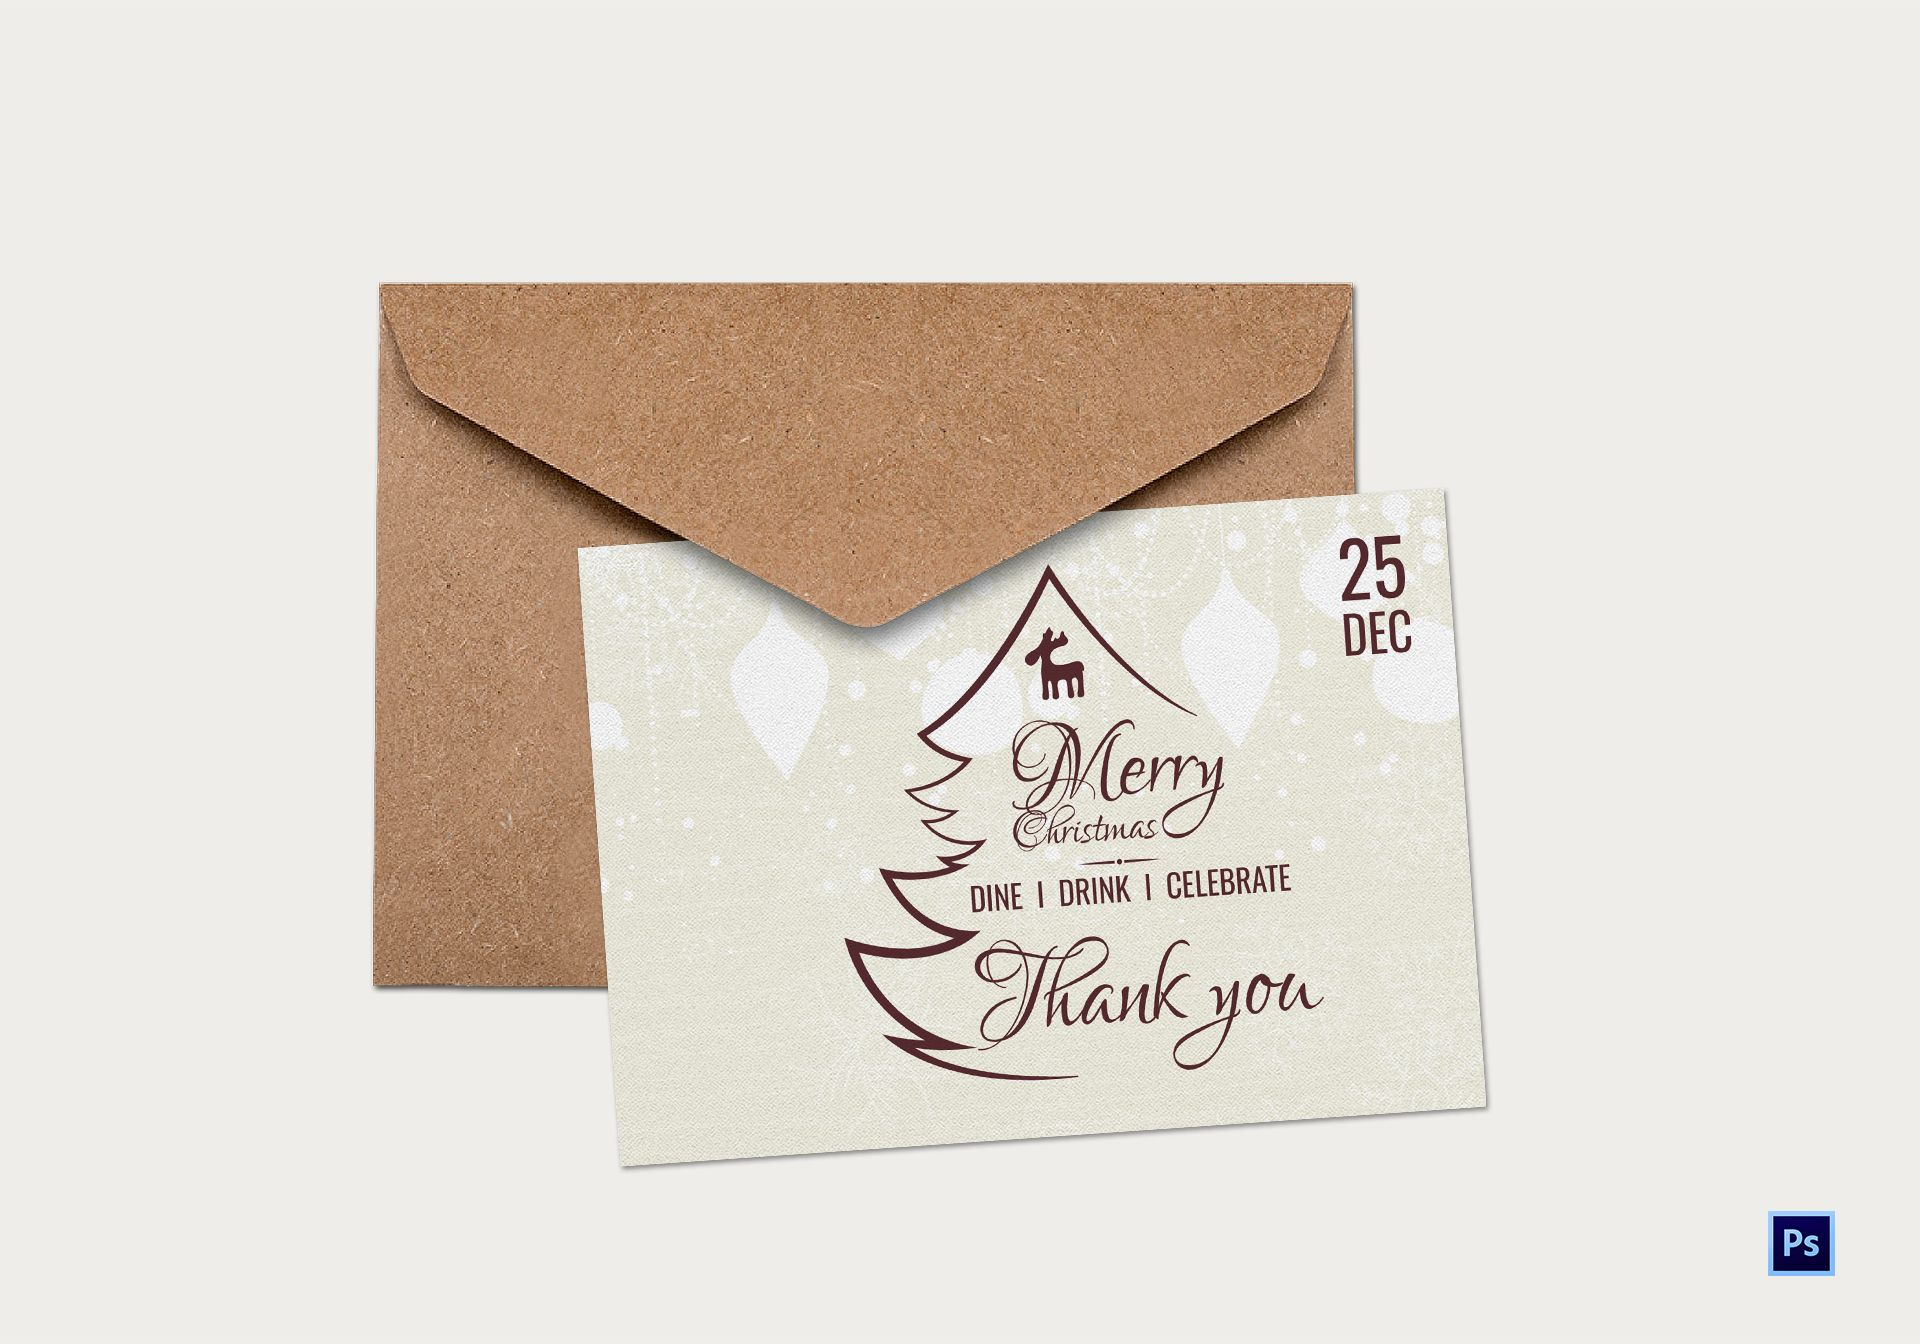 Vintage Christmas Thank You Card Template